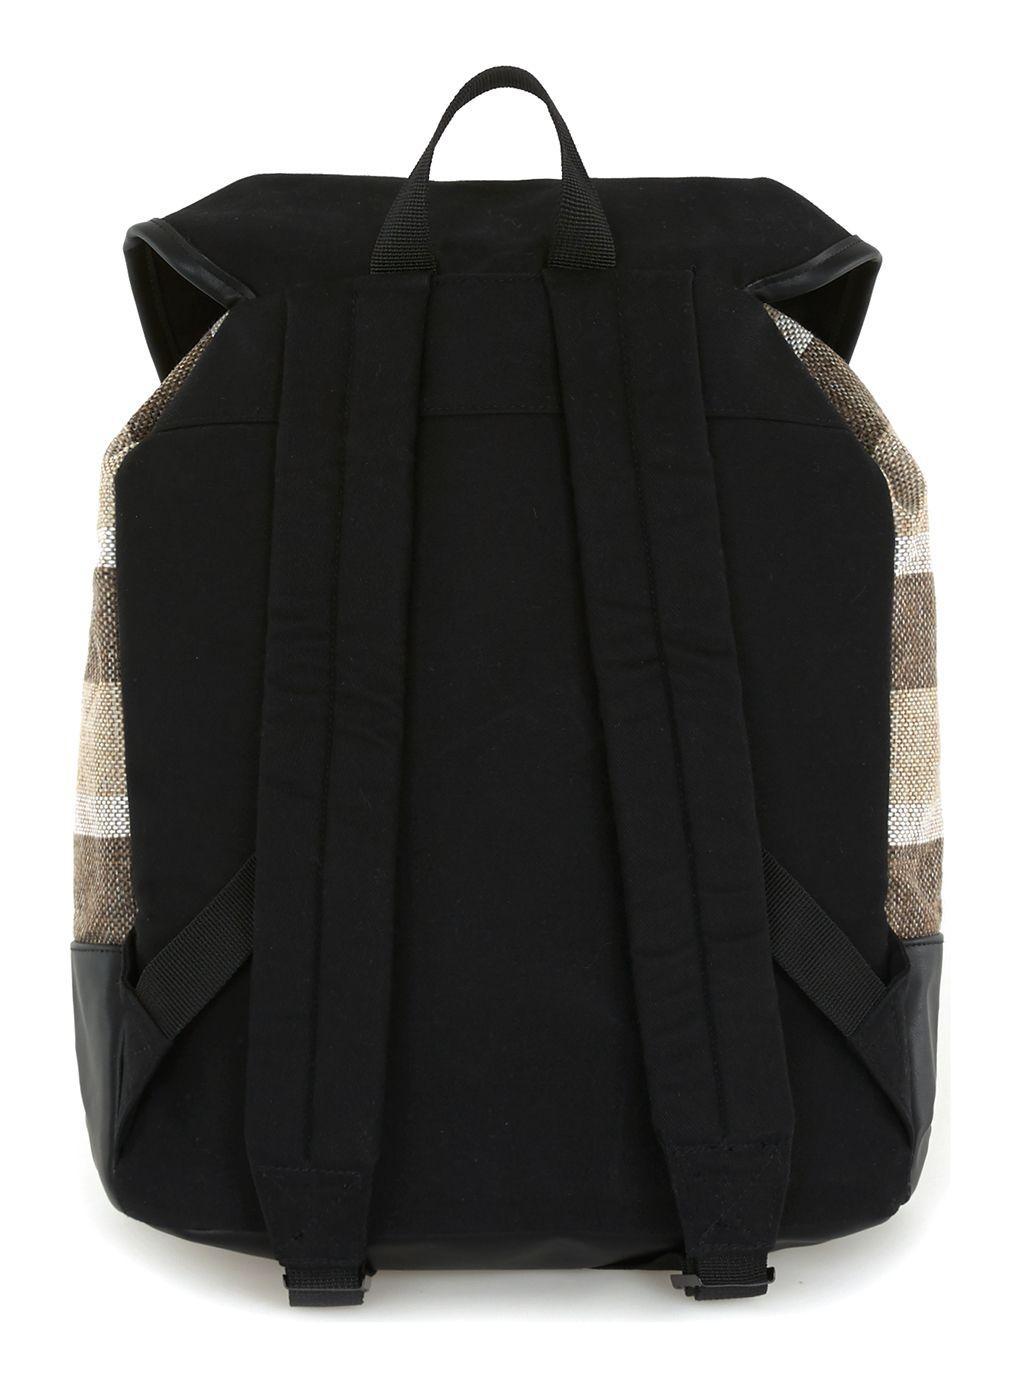 TOPMAN Stripe Canvas Backpack in Black for Men